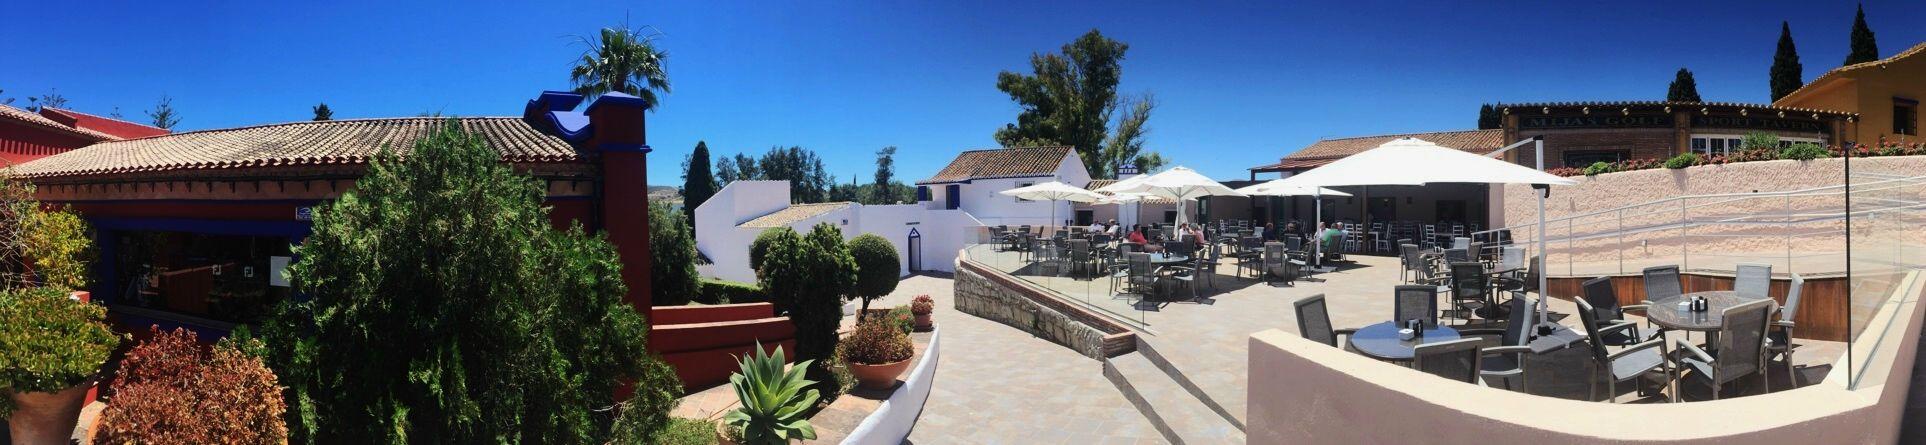 Mijas Golf Casa Club Panoramica